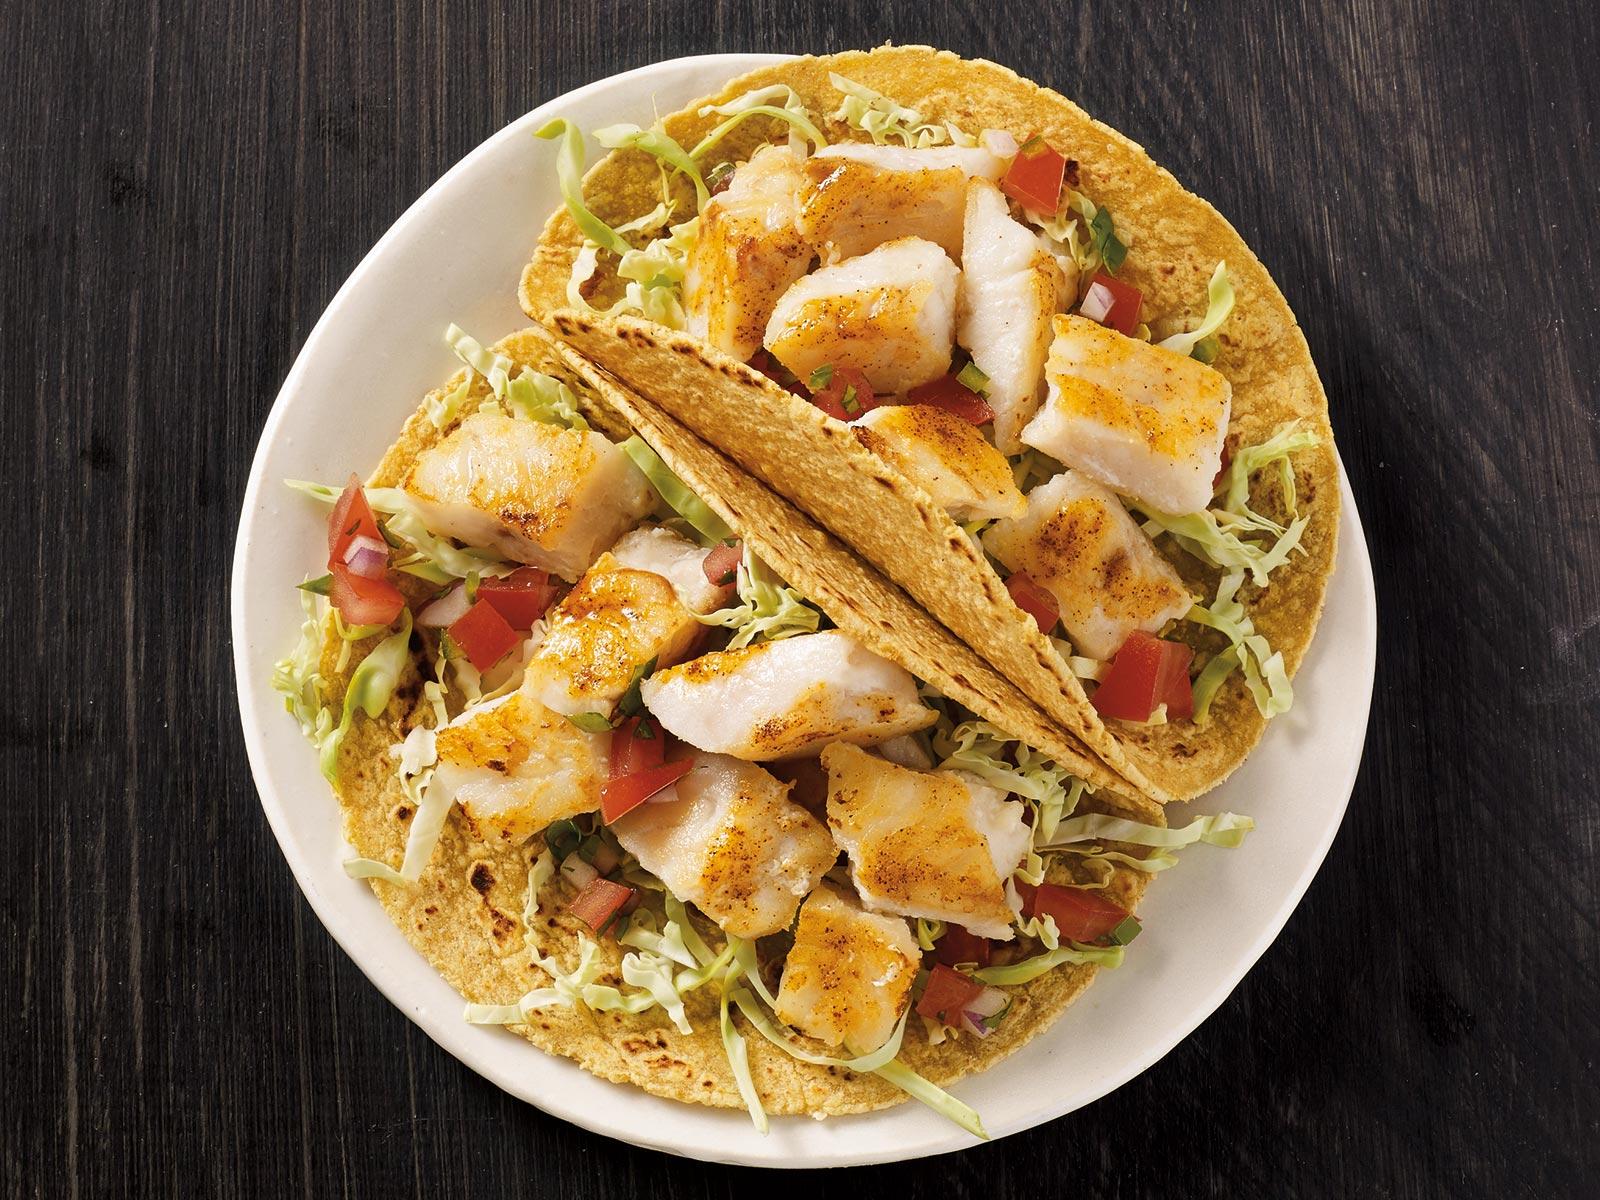 Pollock Tacos